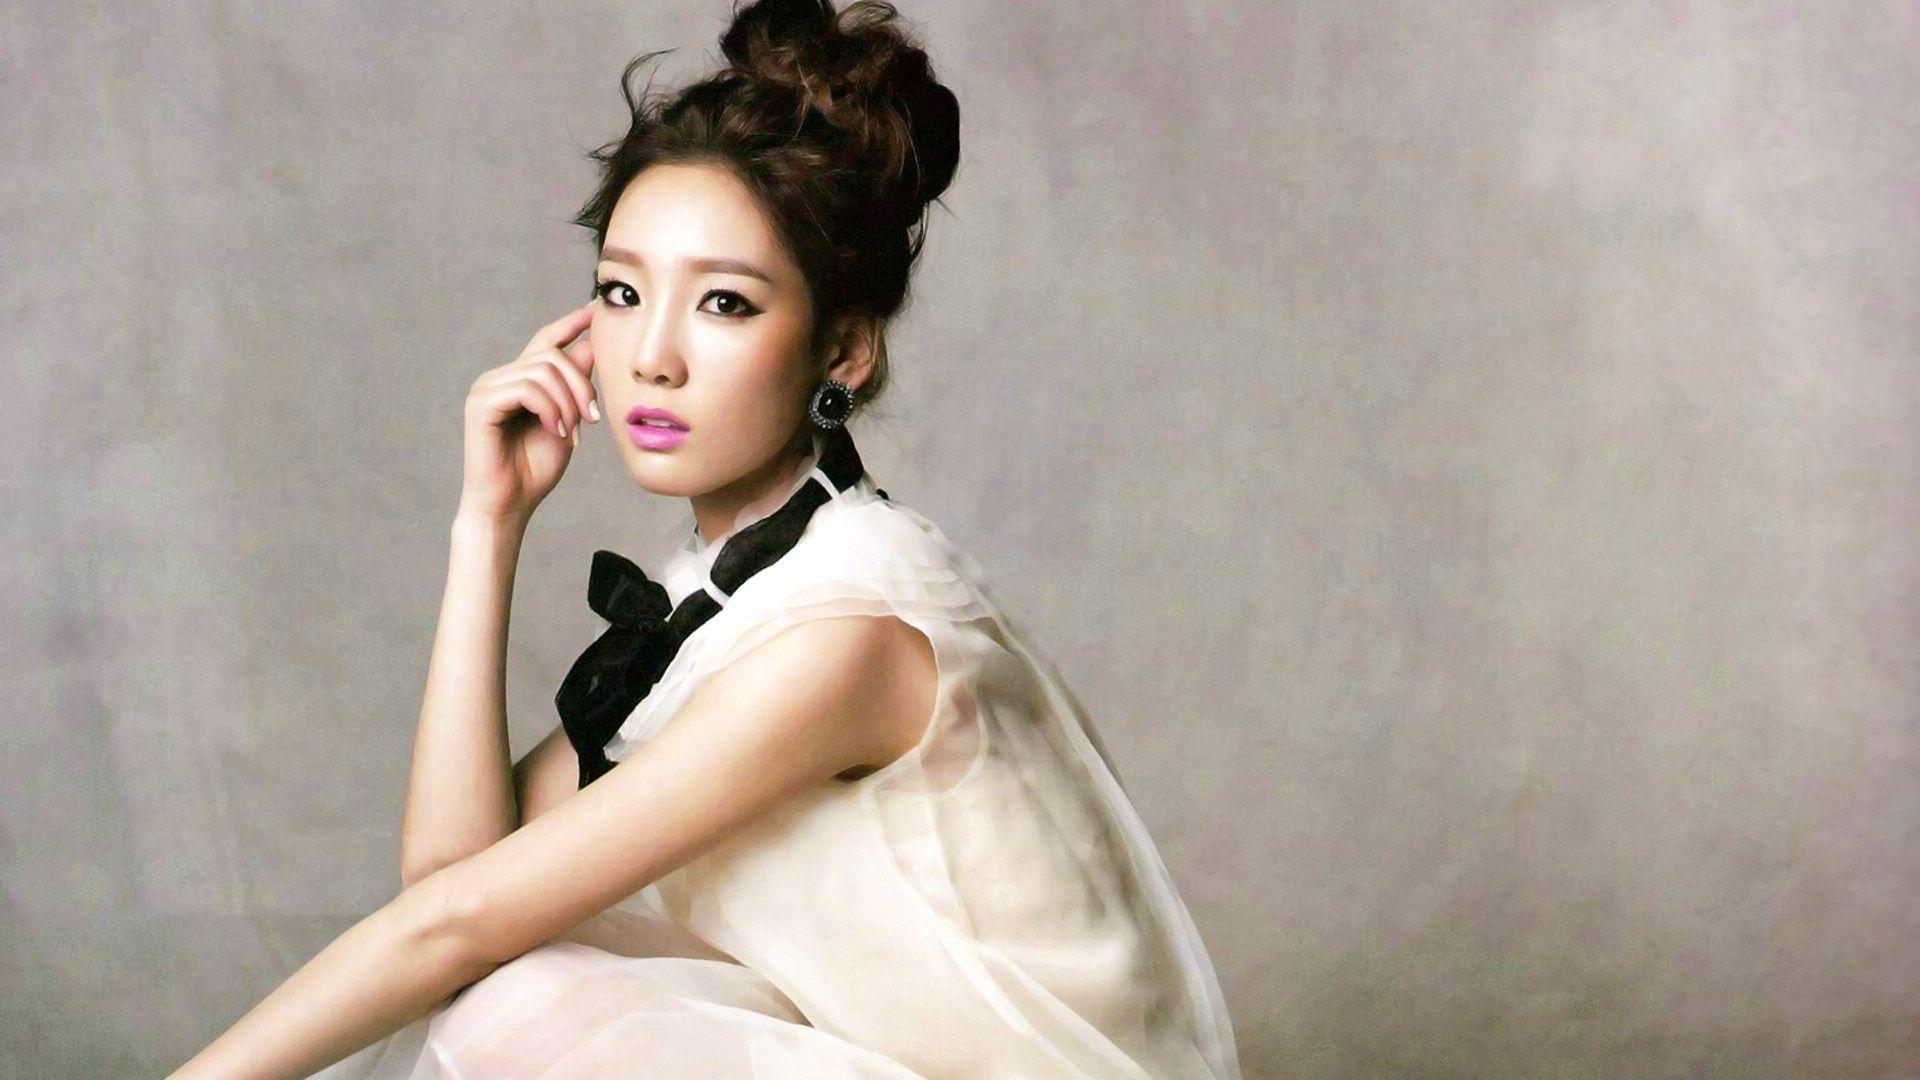 Taeyeon Wallpapers 2016 1920x1080